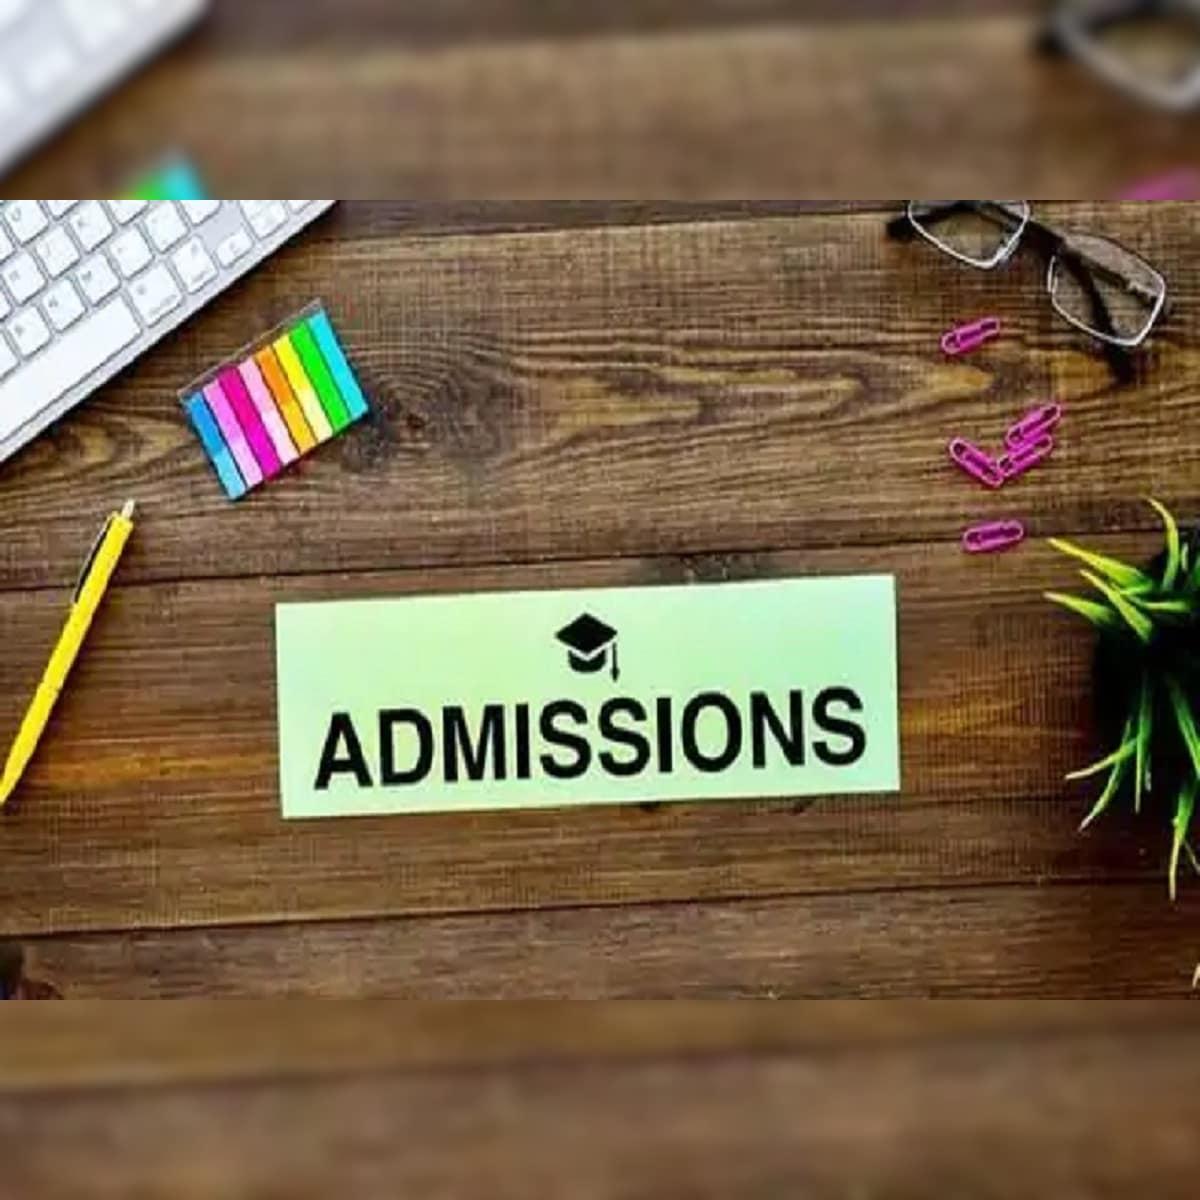 BSEB bihar board admission 2021 application last date for 11th class admission extend till 18th july / Bihar Board Admission 2021 : इंटर में एडमिशन के लिए आवेदन की अंतिम तिथि 18 जुलाई तक बढ़ी – News18 Hindi